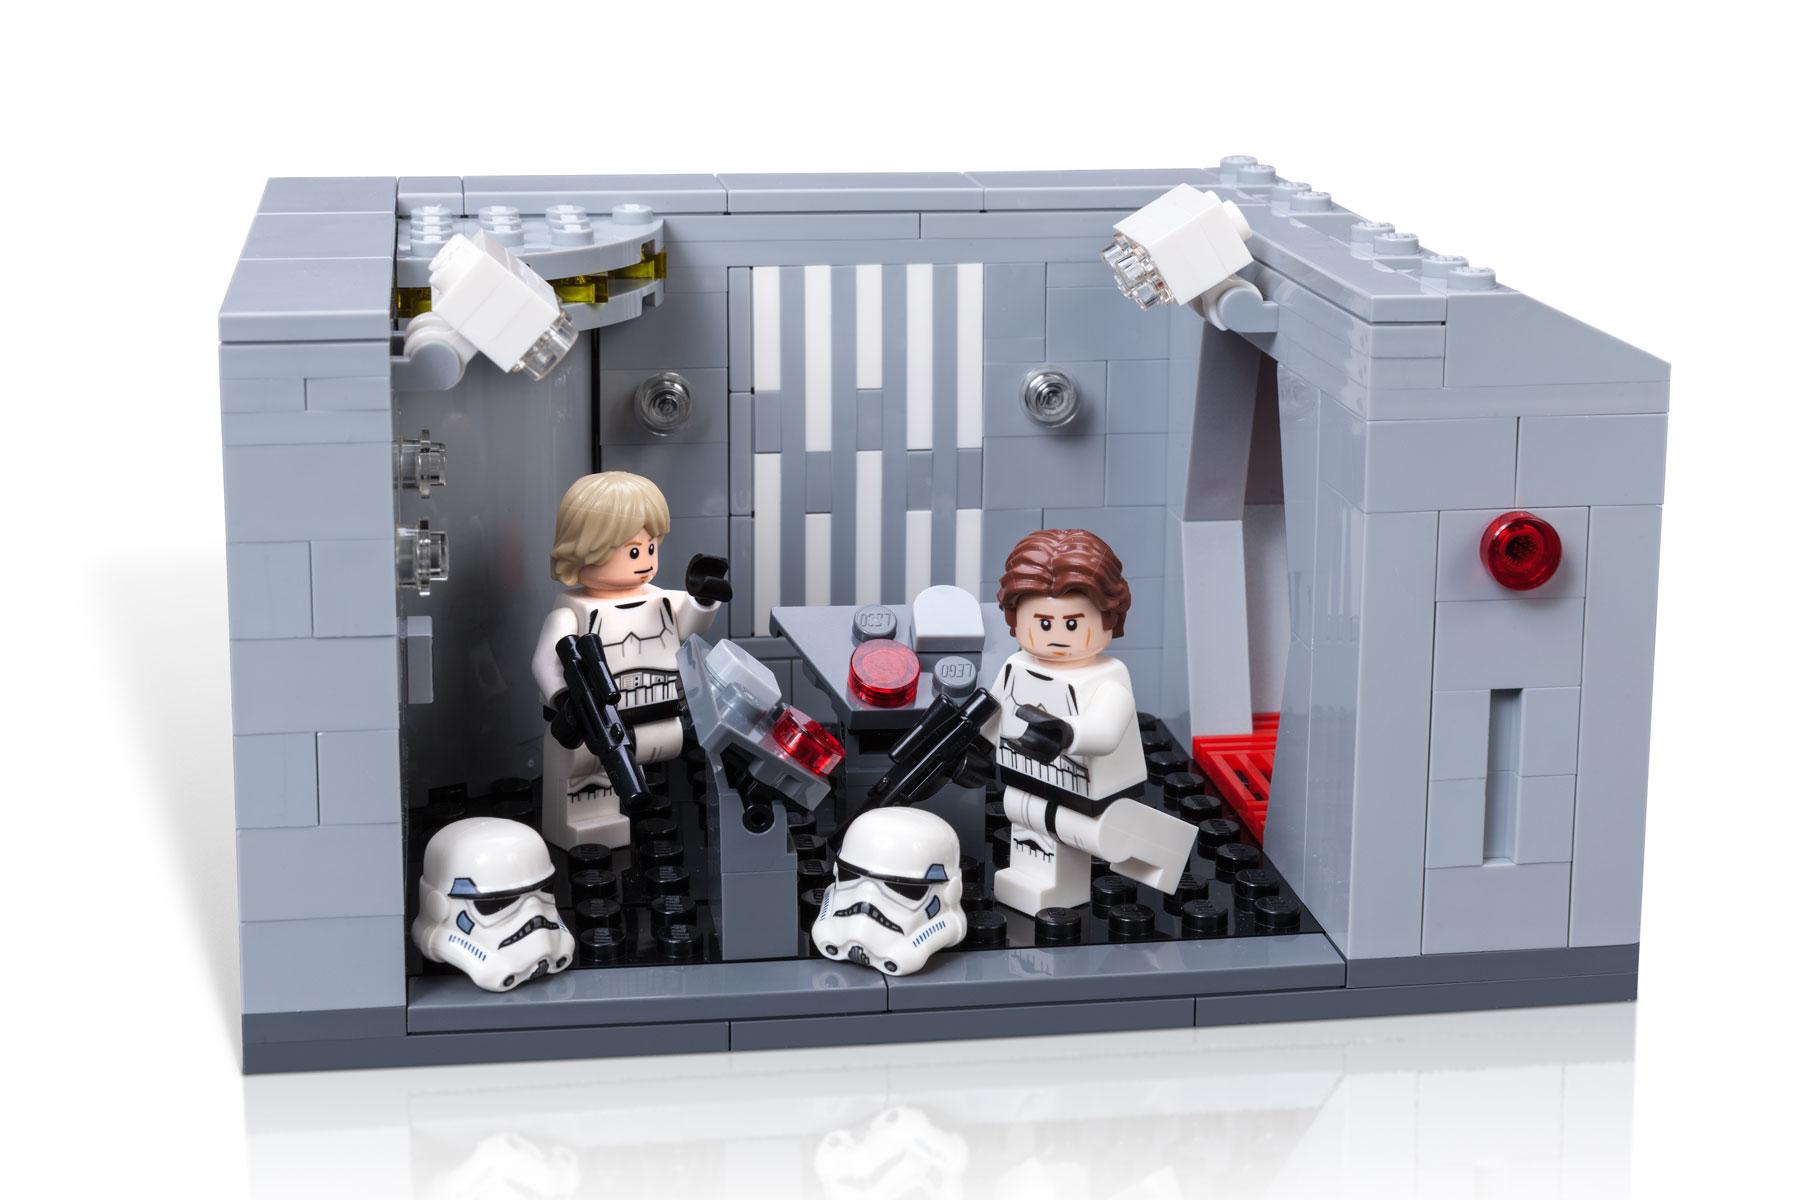 LEGO_CELEBRATION2017_exclusive2.jpg